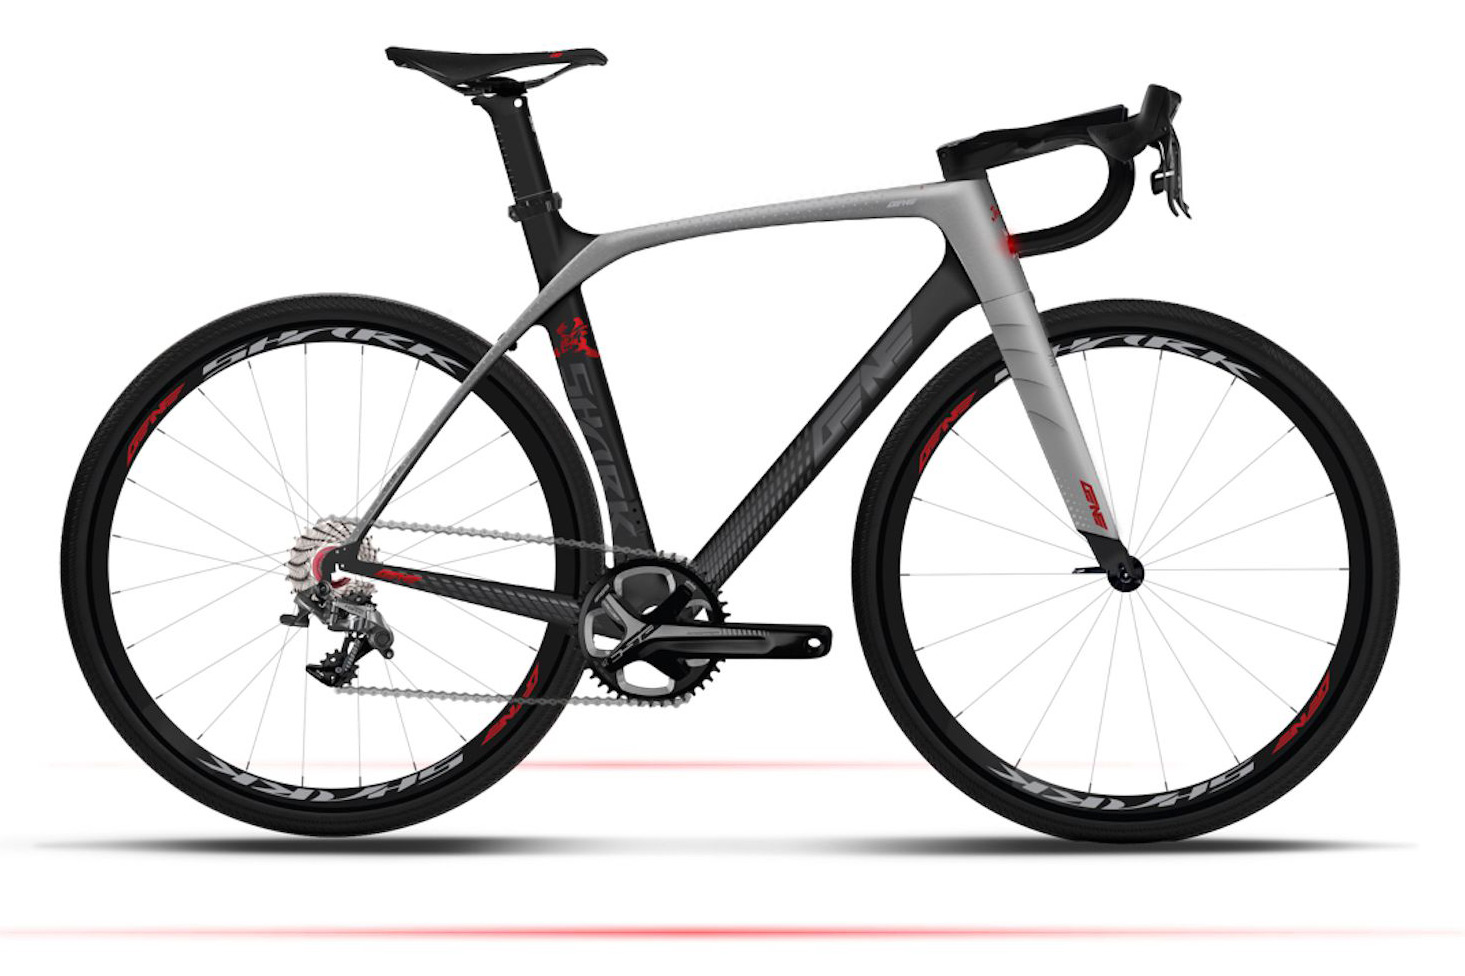 leeco_shark_smart-road-bike_integrated-electronics-sensors-android-bikeos_overall